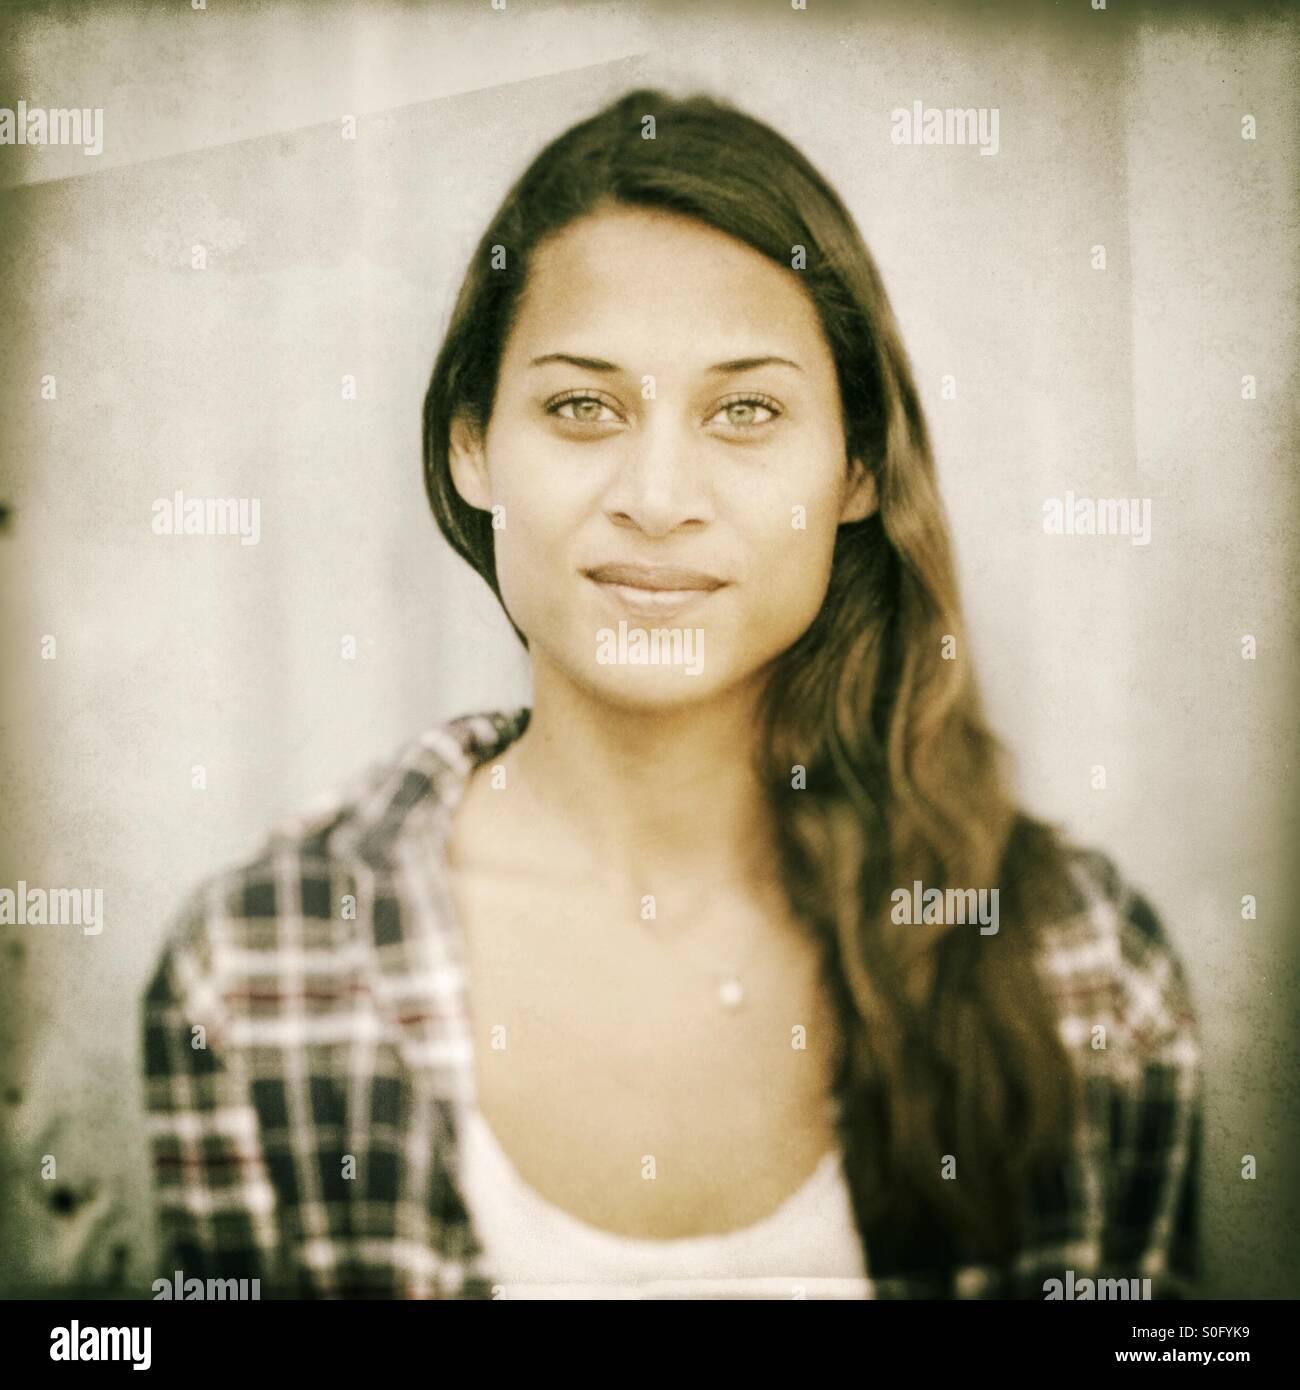 Portrait of a beautiful woman. - Stock Image